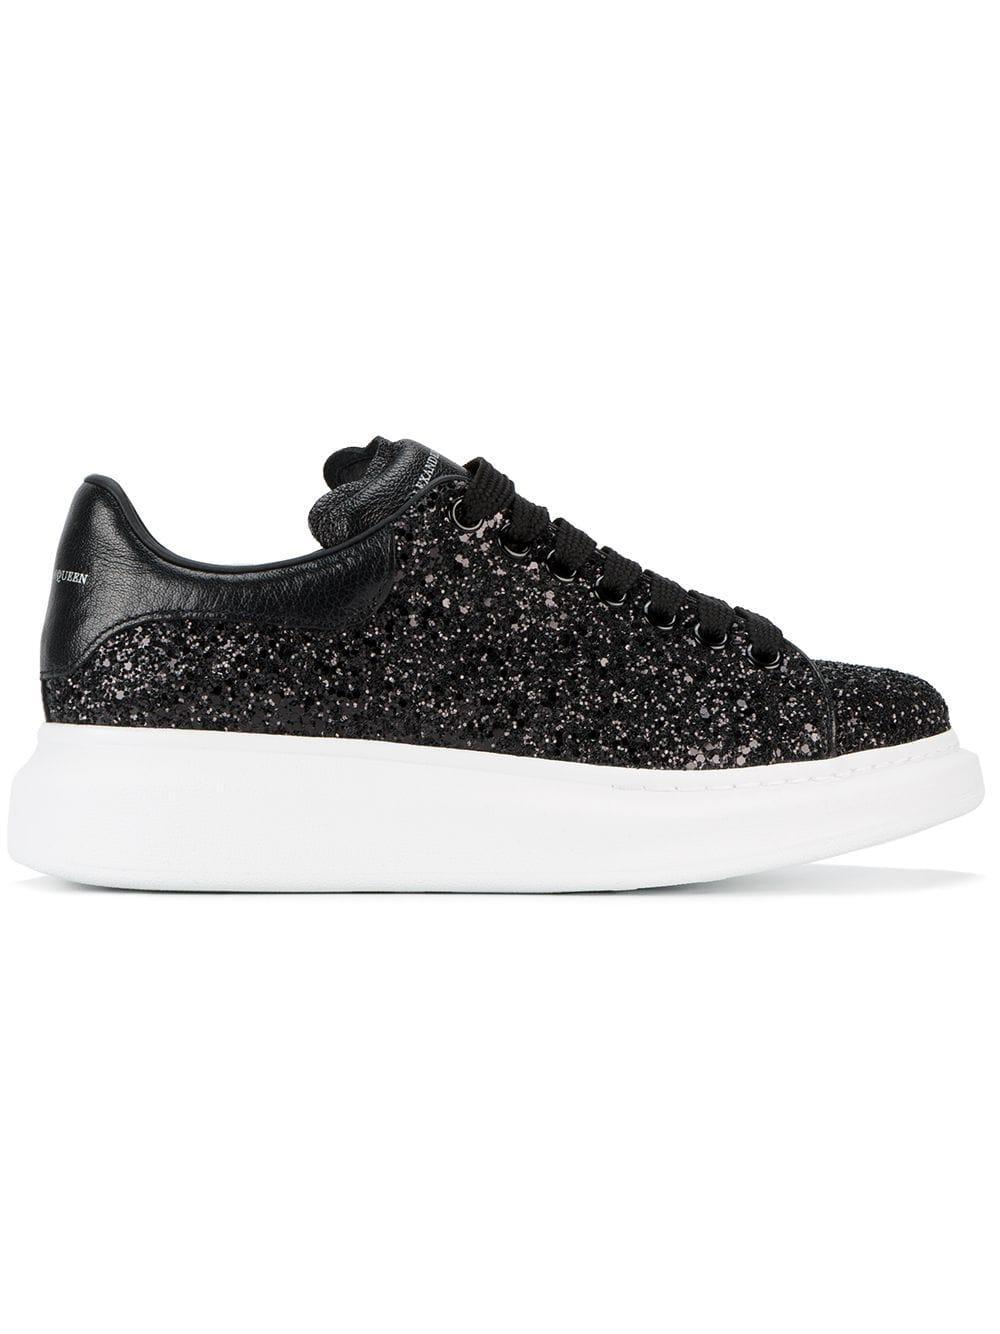 e55f239941c3 Alexander McQueen - Black Glitter Platform Sneakers - Lyst. View fullscreen